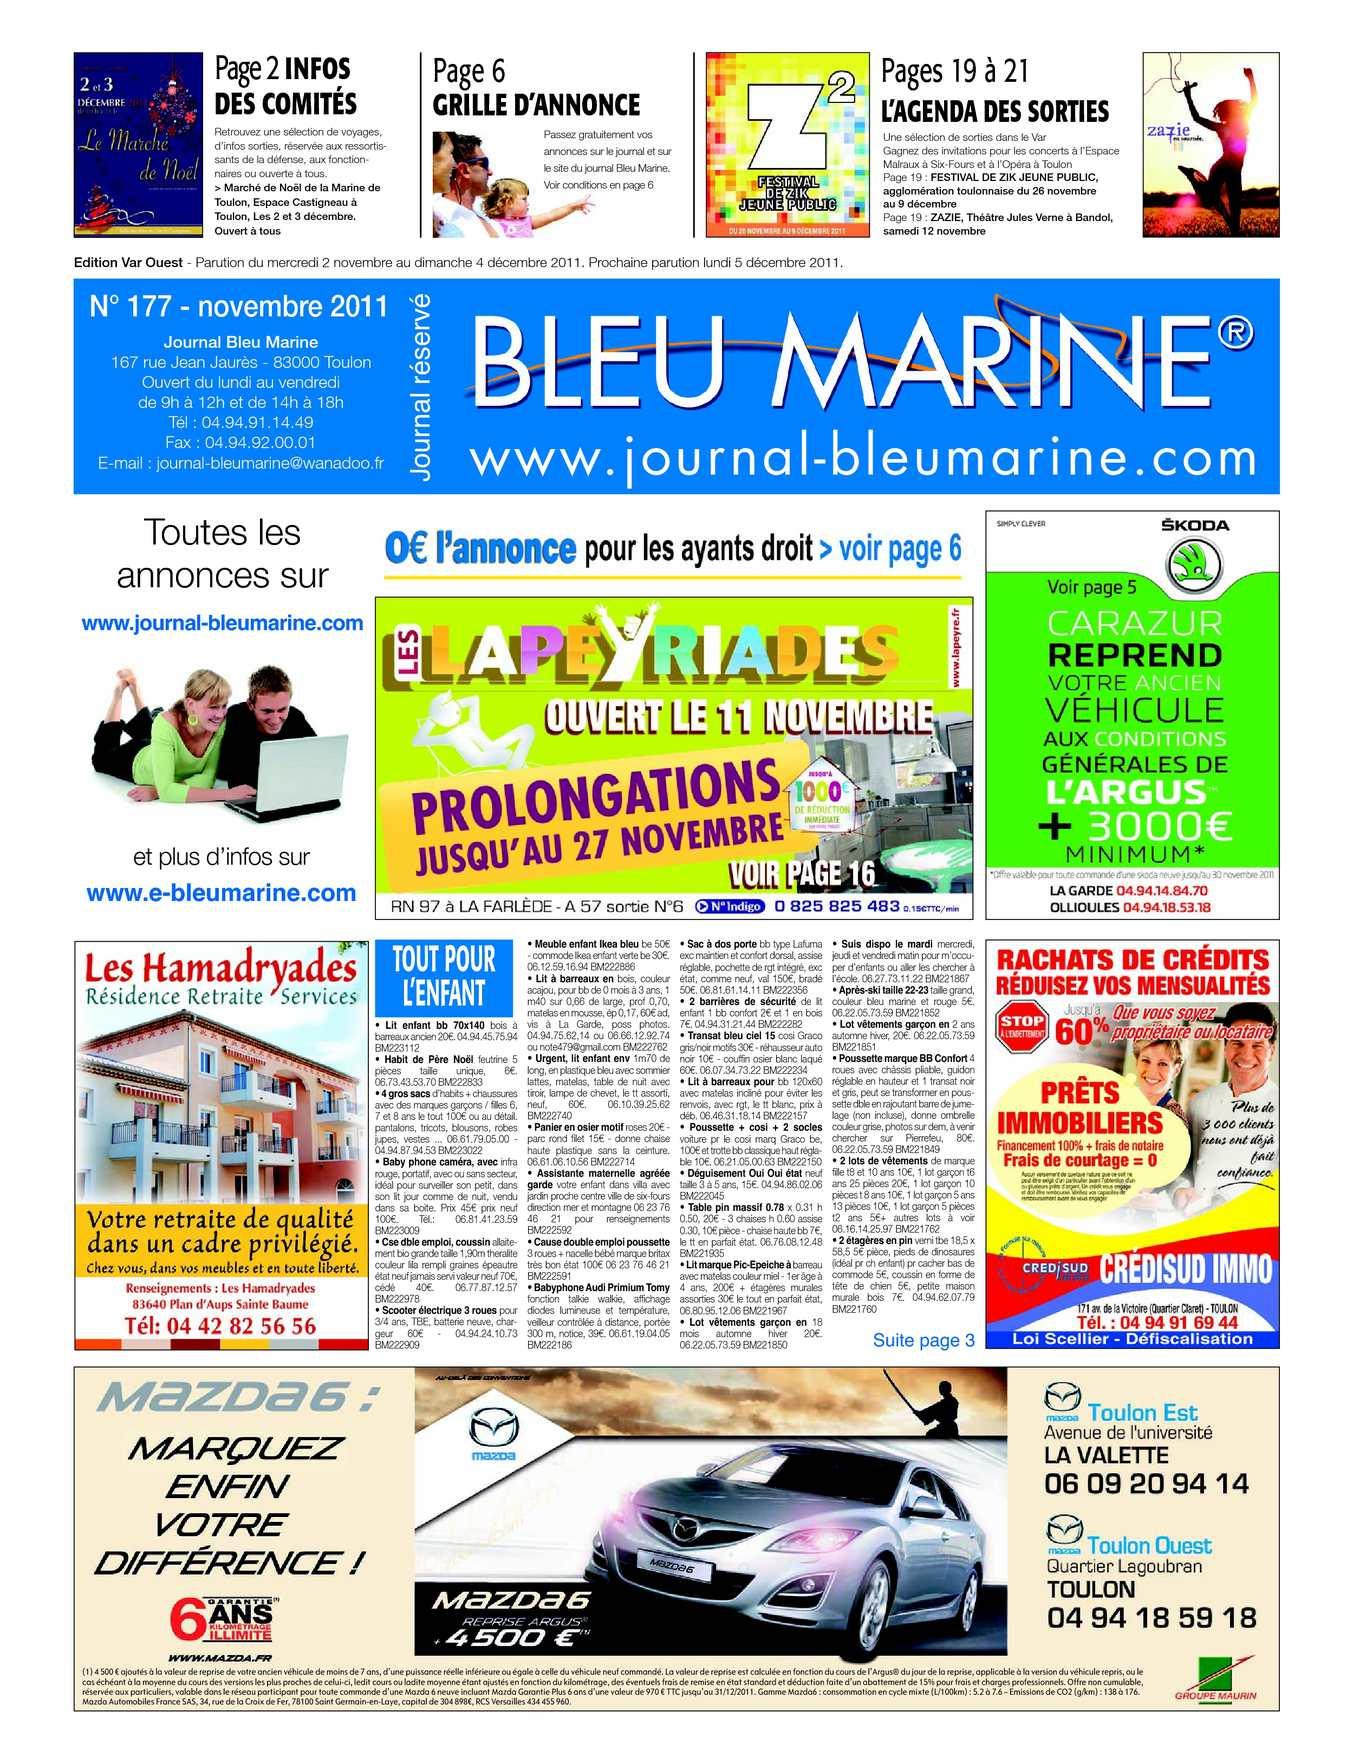 Calaméo - Journal Bleu Marine 177 novembre 2011 037a20945ce3